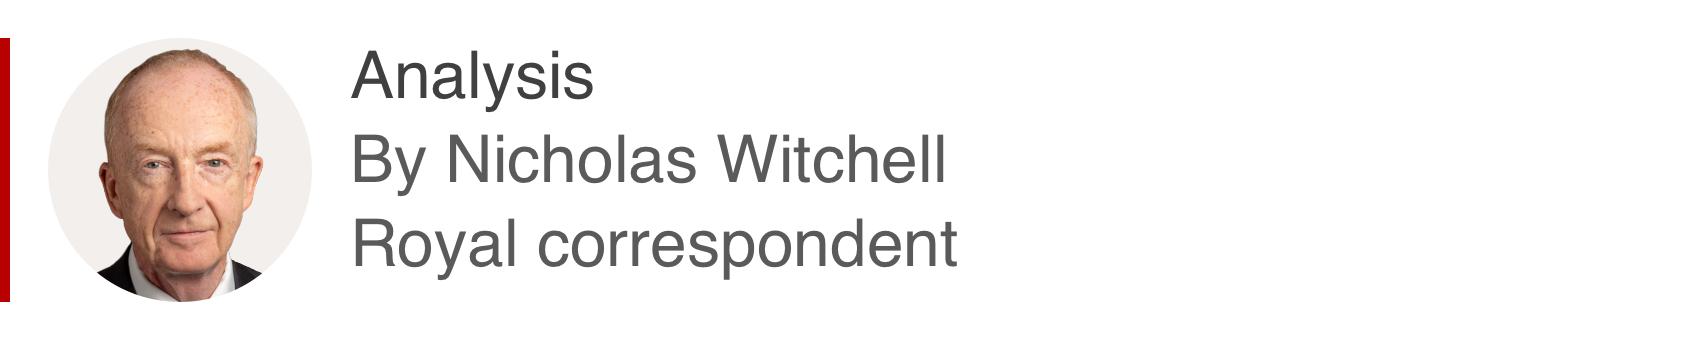 Analysis box by Nicholas Witchell, royal correspondent